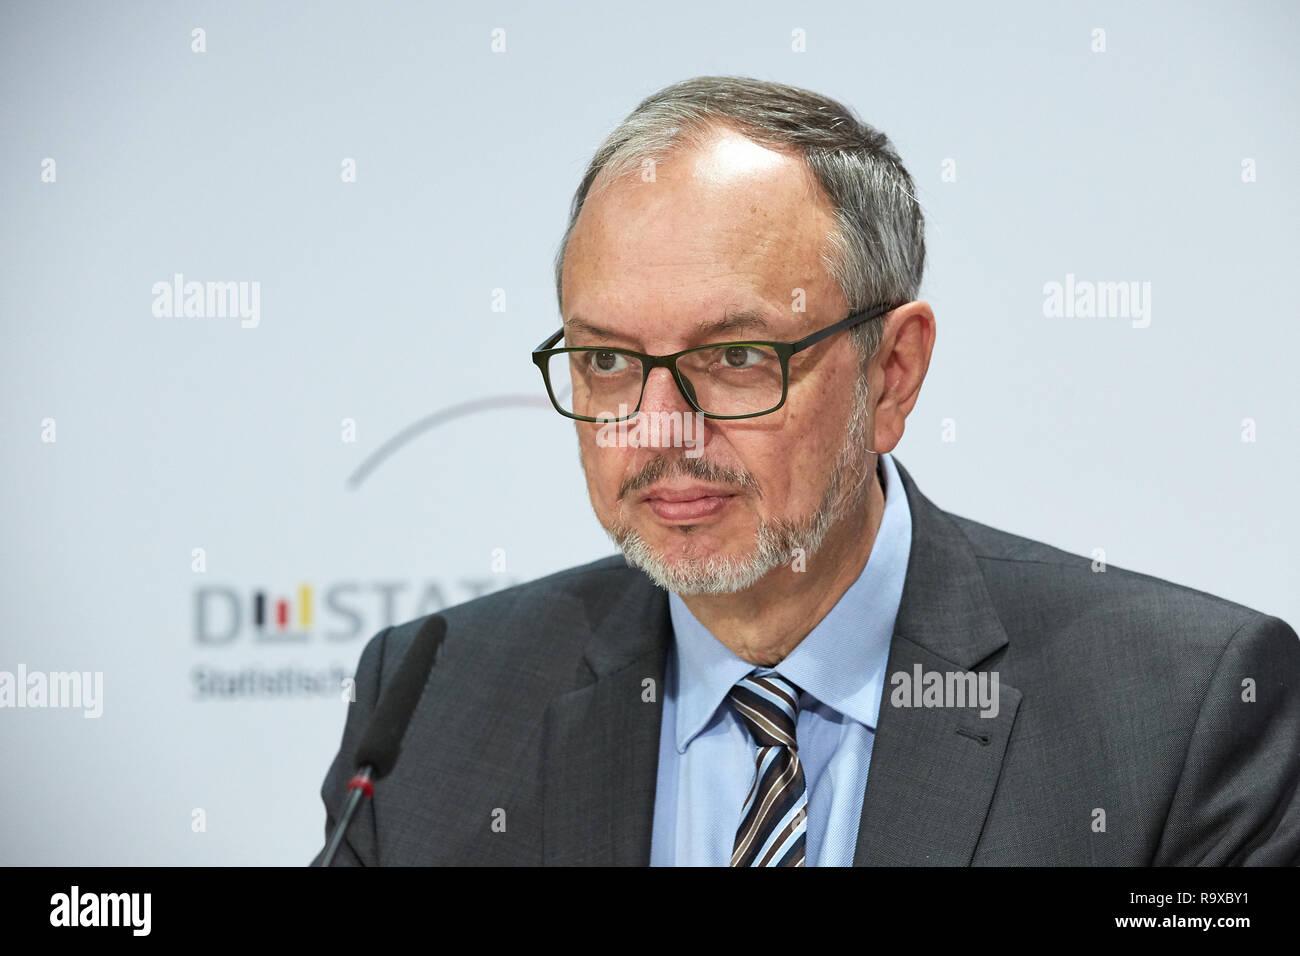 18.10.2018, Berlin, Deutschland - Dr. Georg Thiel -Praesident des Statistischen Bundesamtes. 00R181018D036 [MODEL RELEASE: NO, PROPERTY RELEASE: NO (c - Stock Image